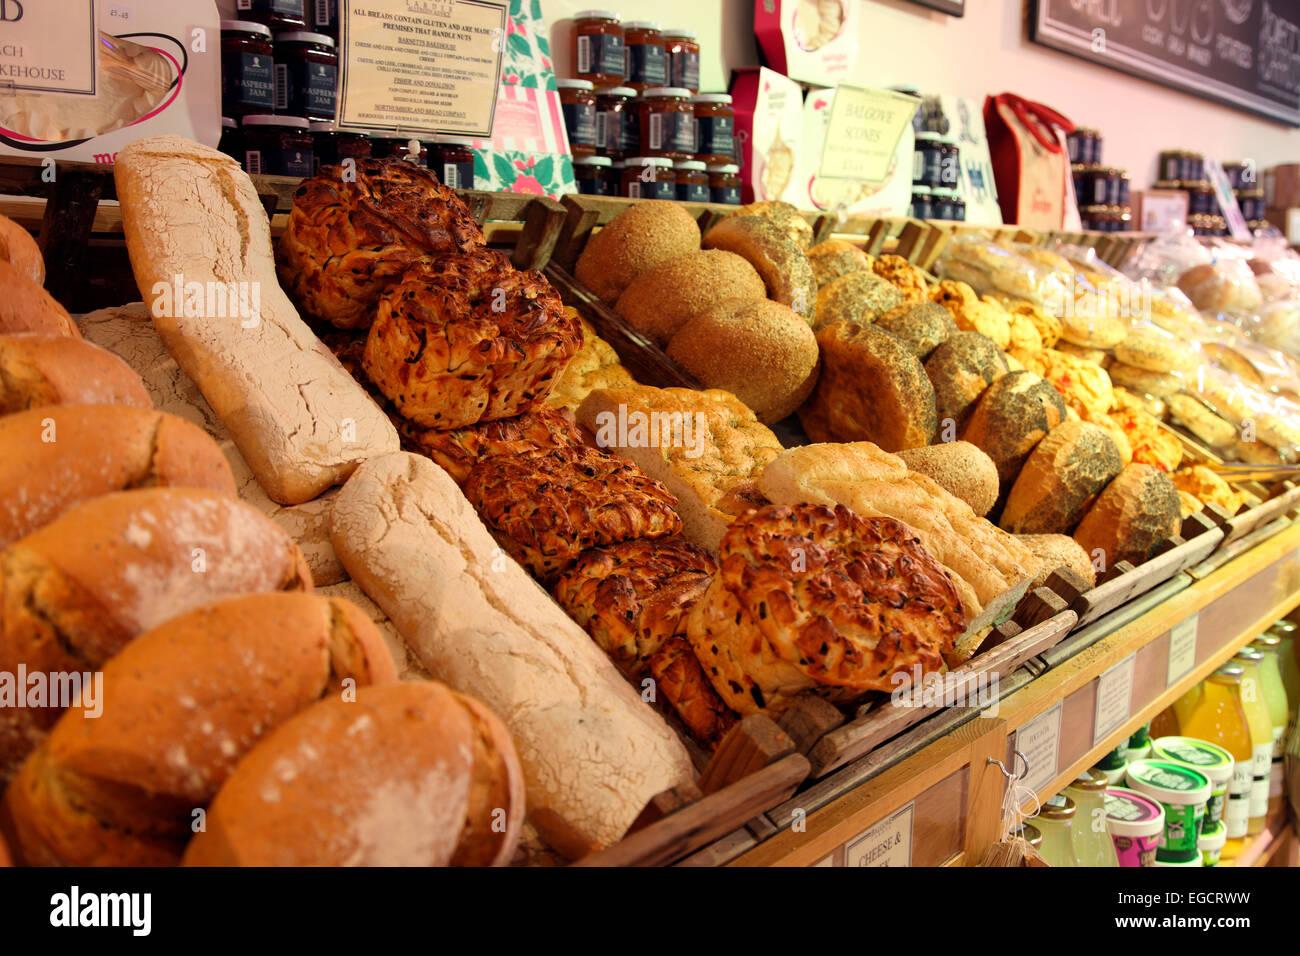 Artisan bread on sale at Balgove Larder - Stock Image